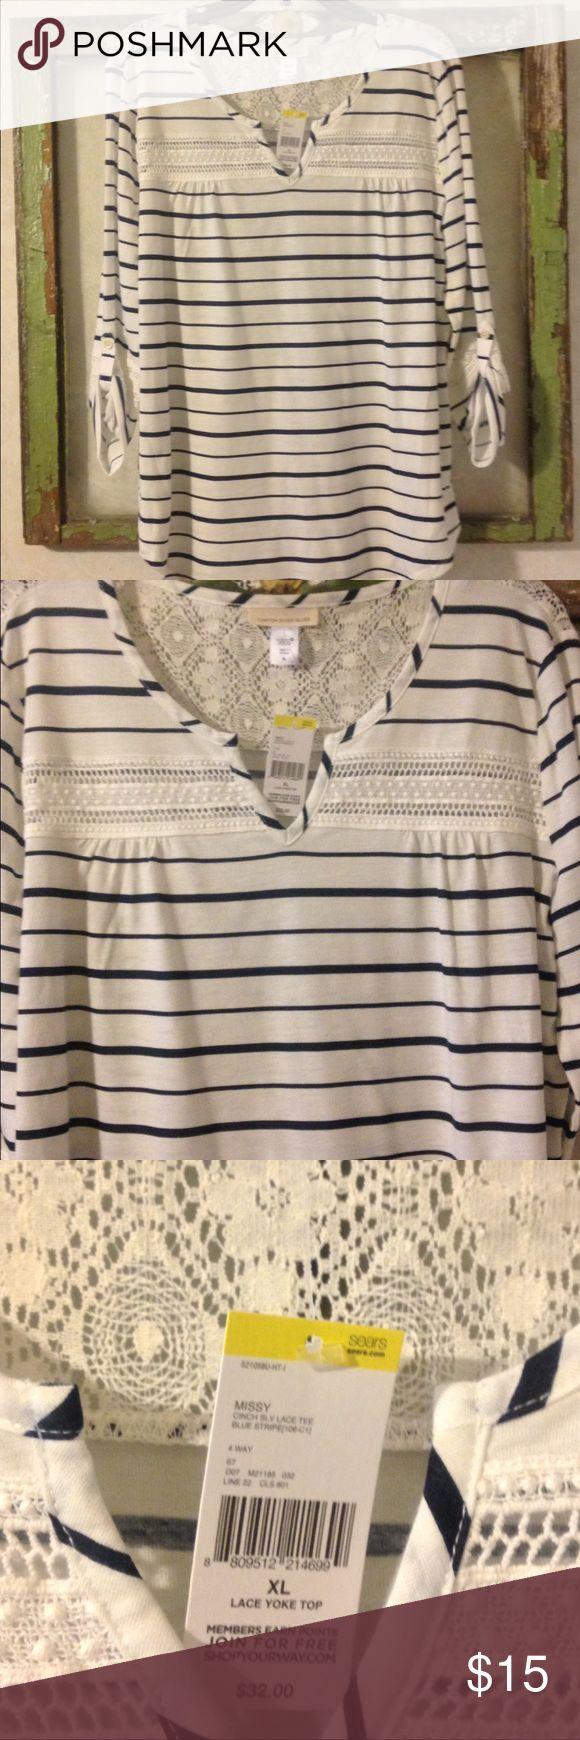 New, Canyon River Blues Shirt. Size XL New, Canyon River Blues Shirt. Size XL Canyon River Blues Tops